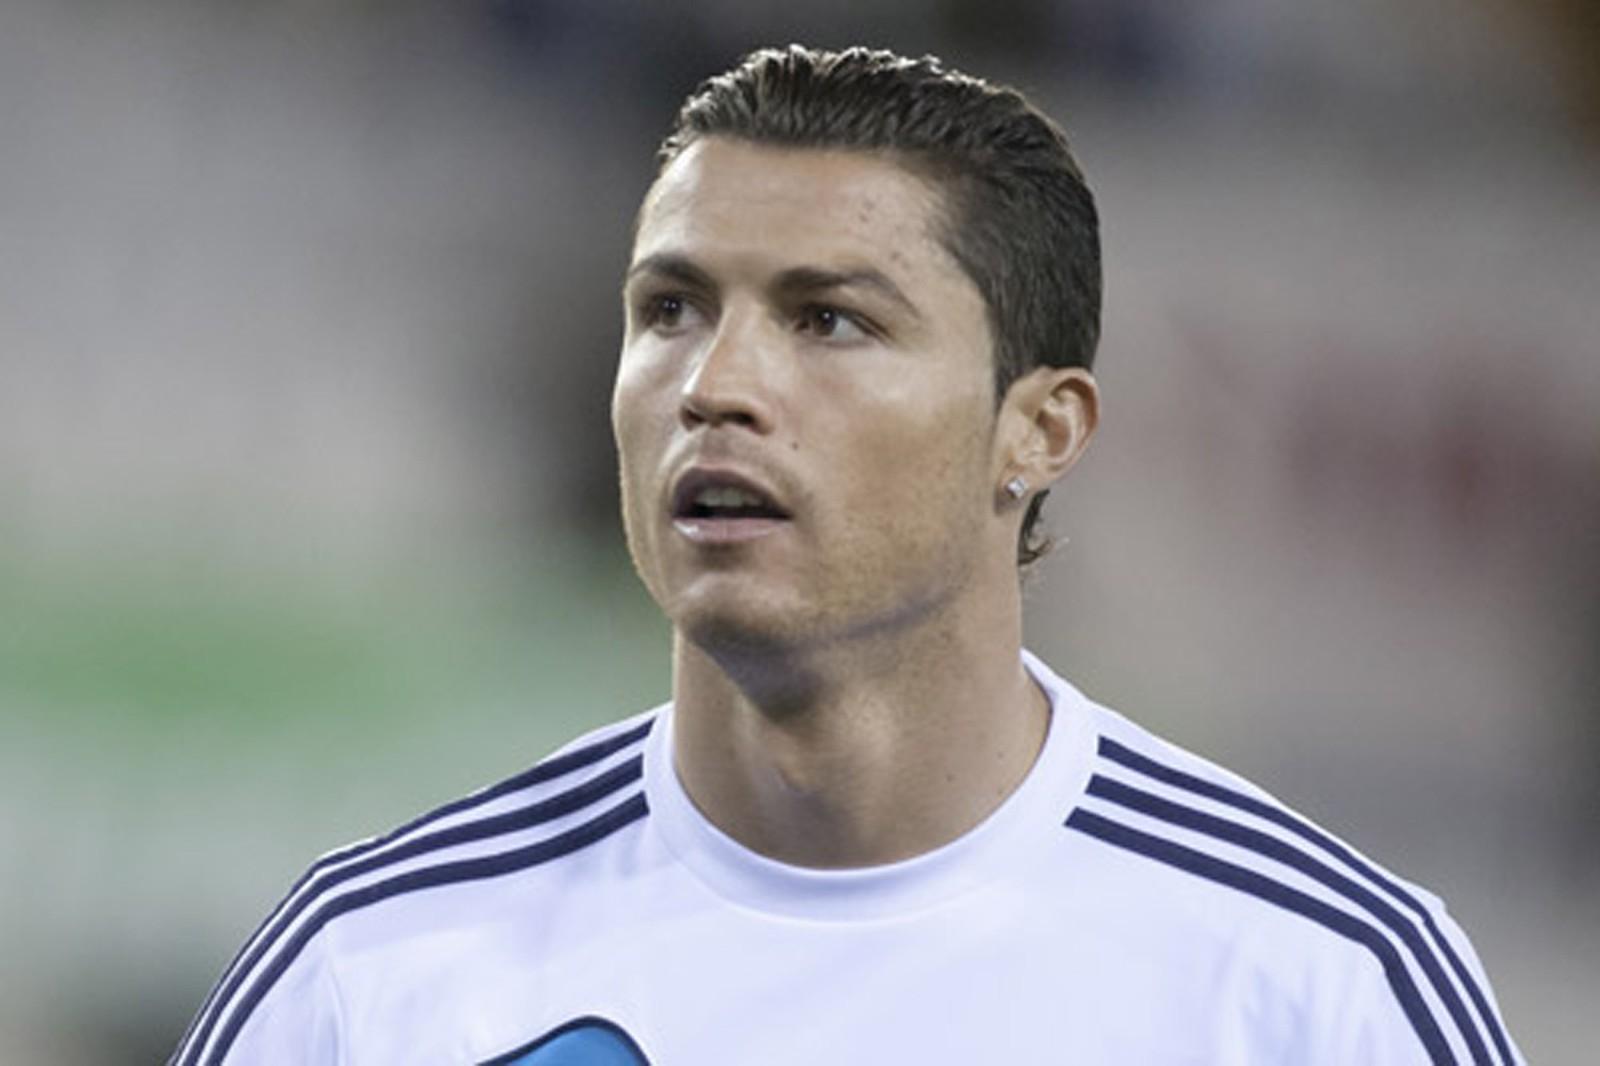 Ronaldo Sachen